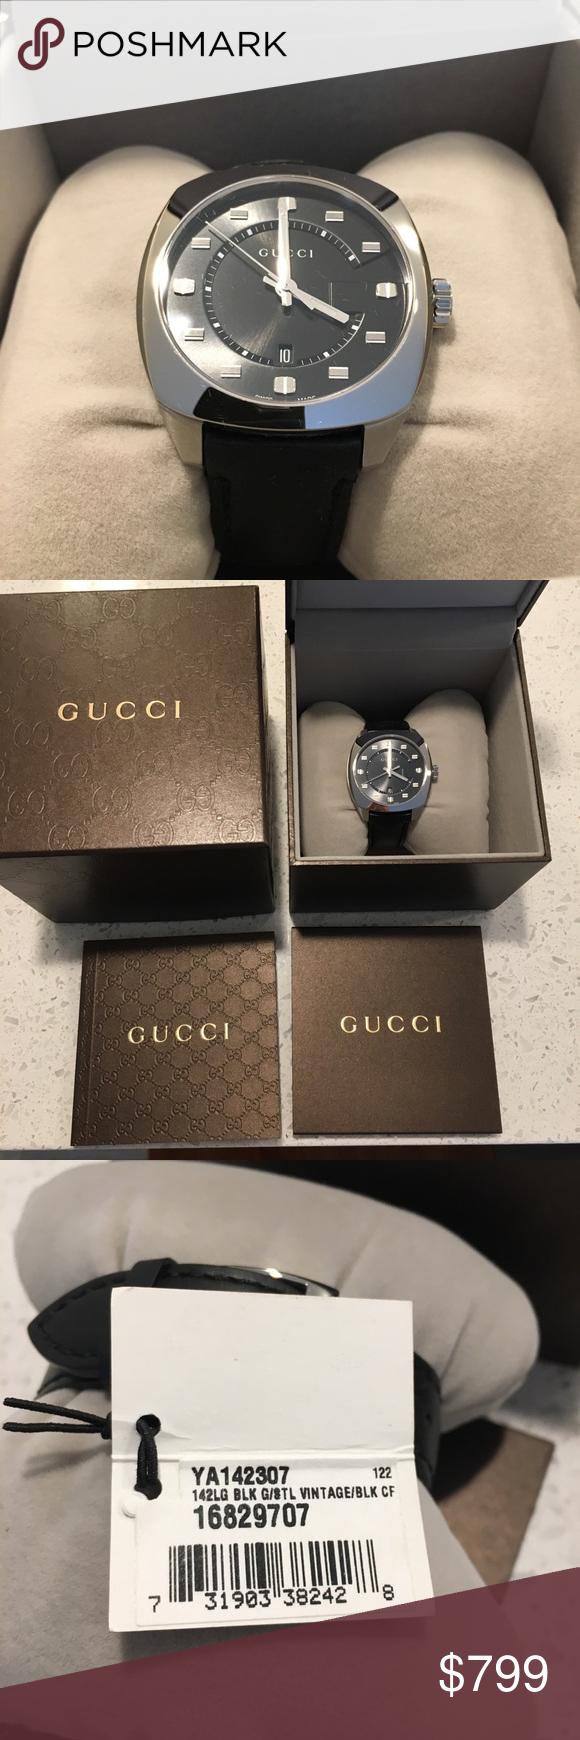 53013d3bca9 NWT Gucci GG2570 Men s Watch YA142307 NWT. Comes with original box